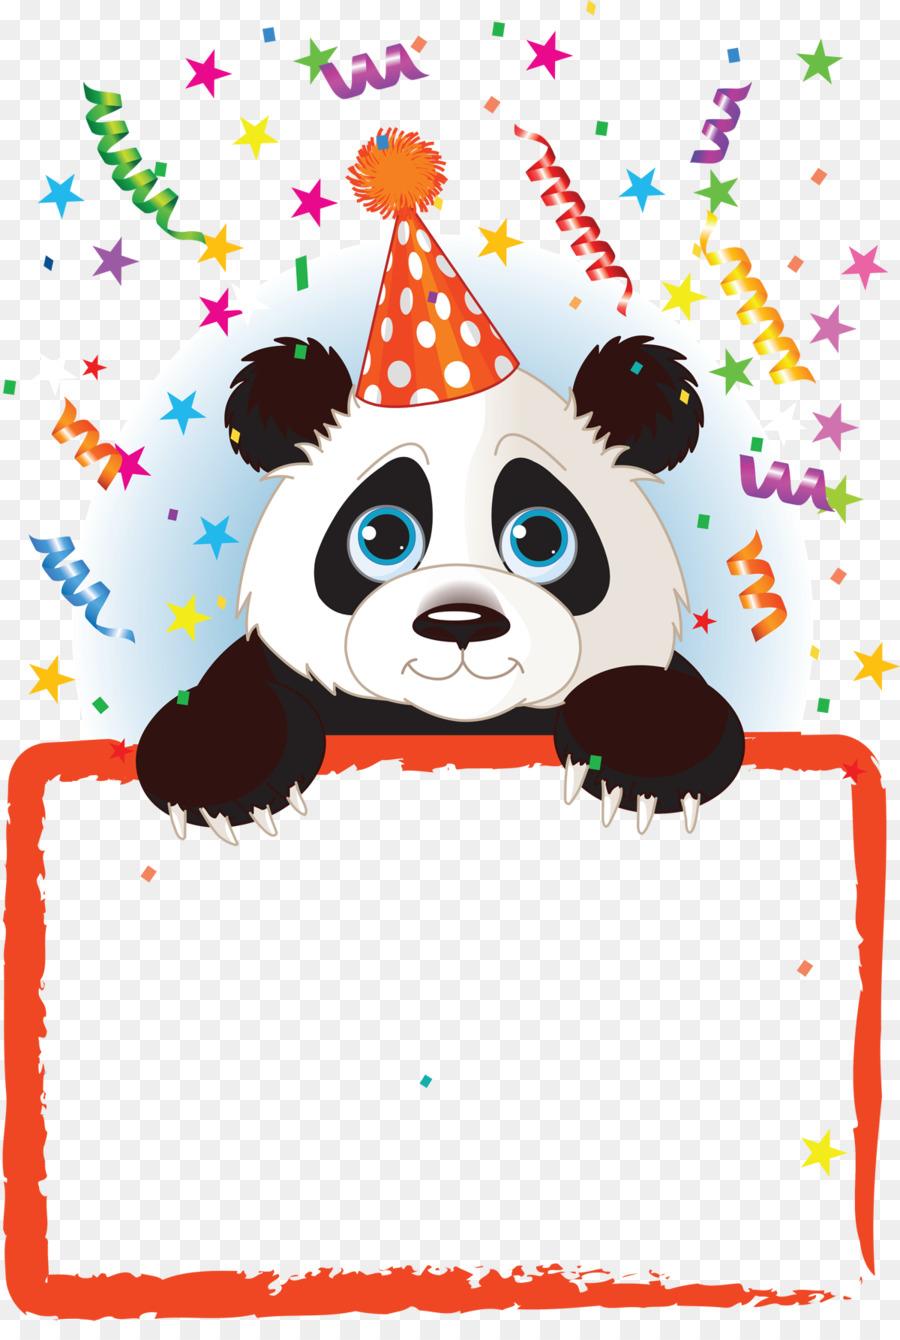 Giant panda Birthday Bear Clip art - birthday invitation png ...